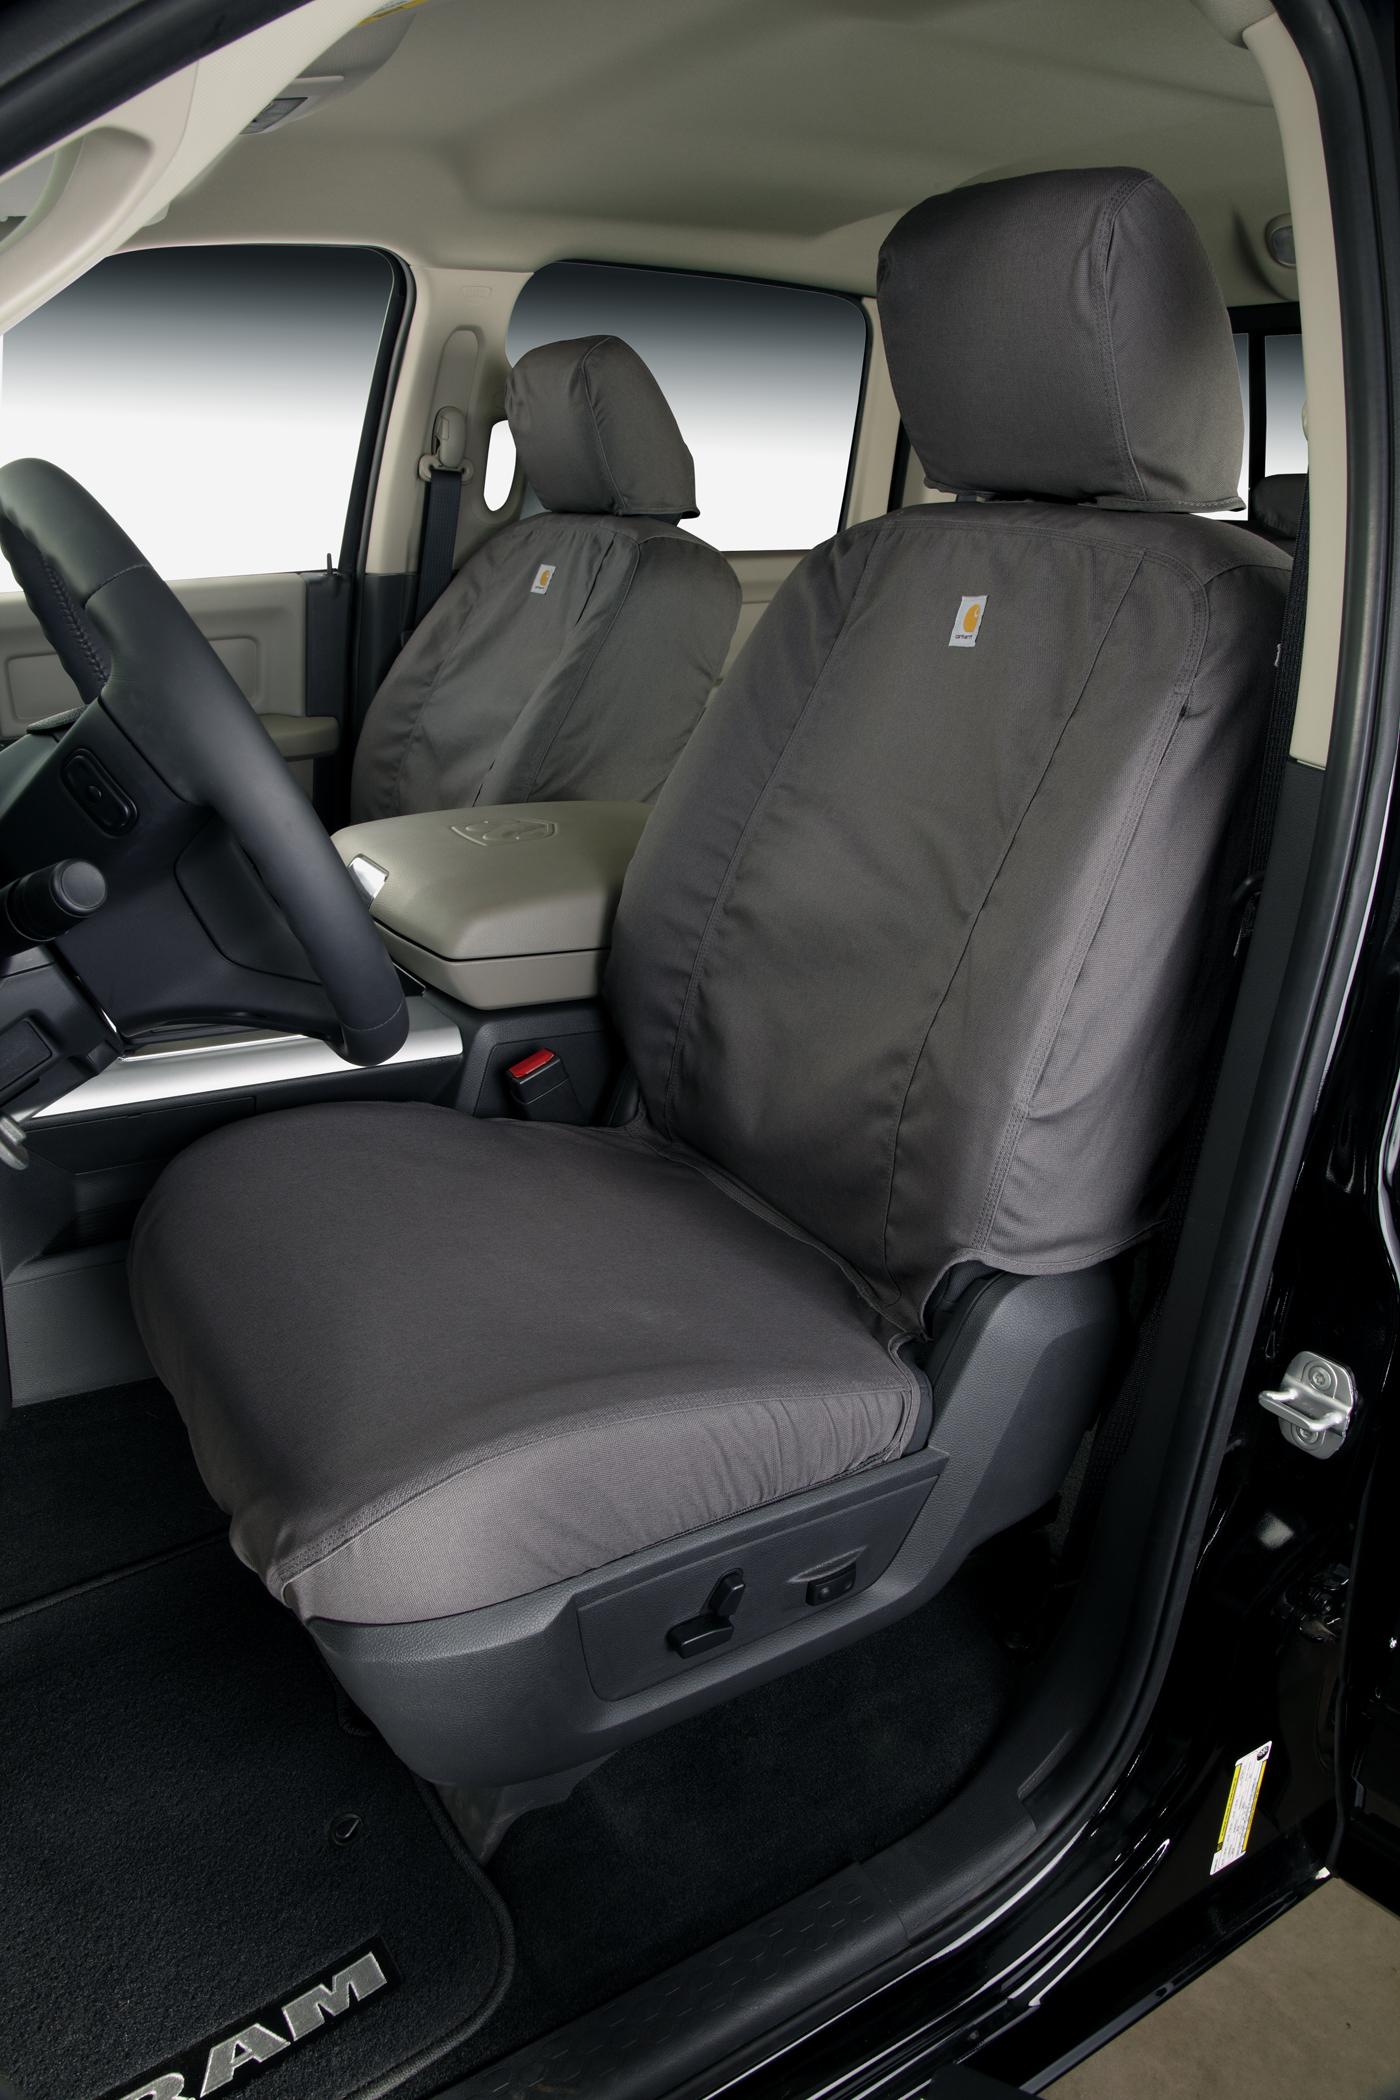 Carhartt Seat Covers Silverado